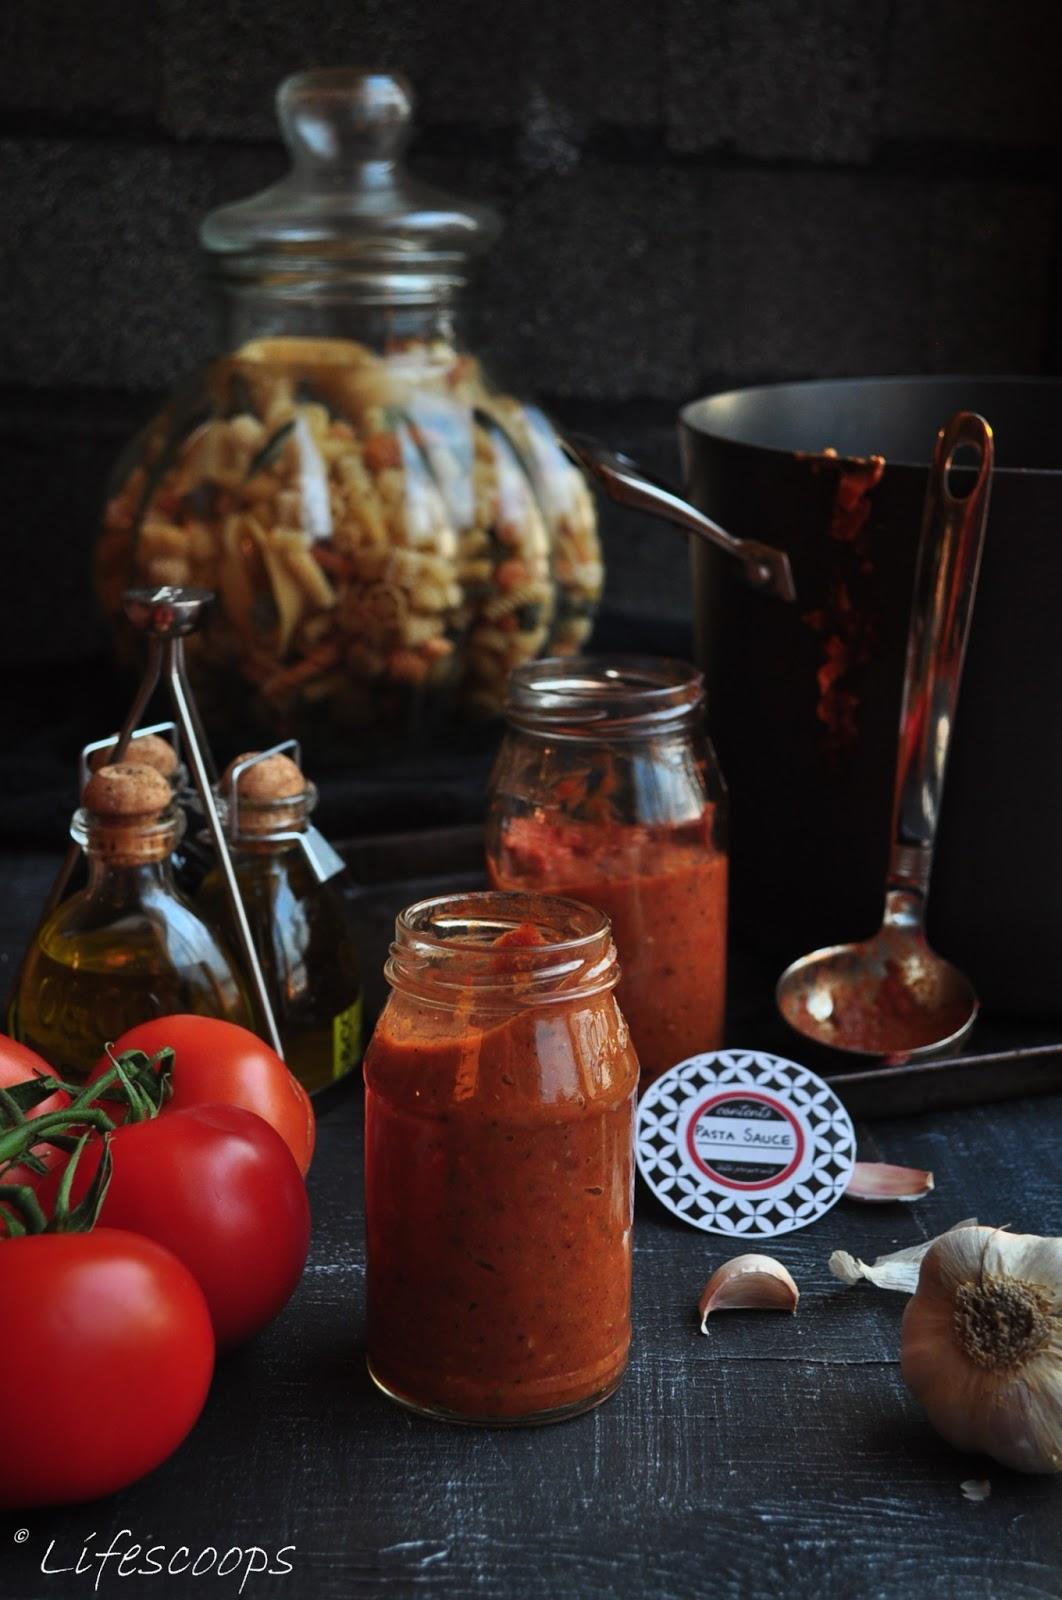 ... Roasted Tomato and Garlic Pasta Sauce (Marinara sauce/Spaghetti sauce